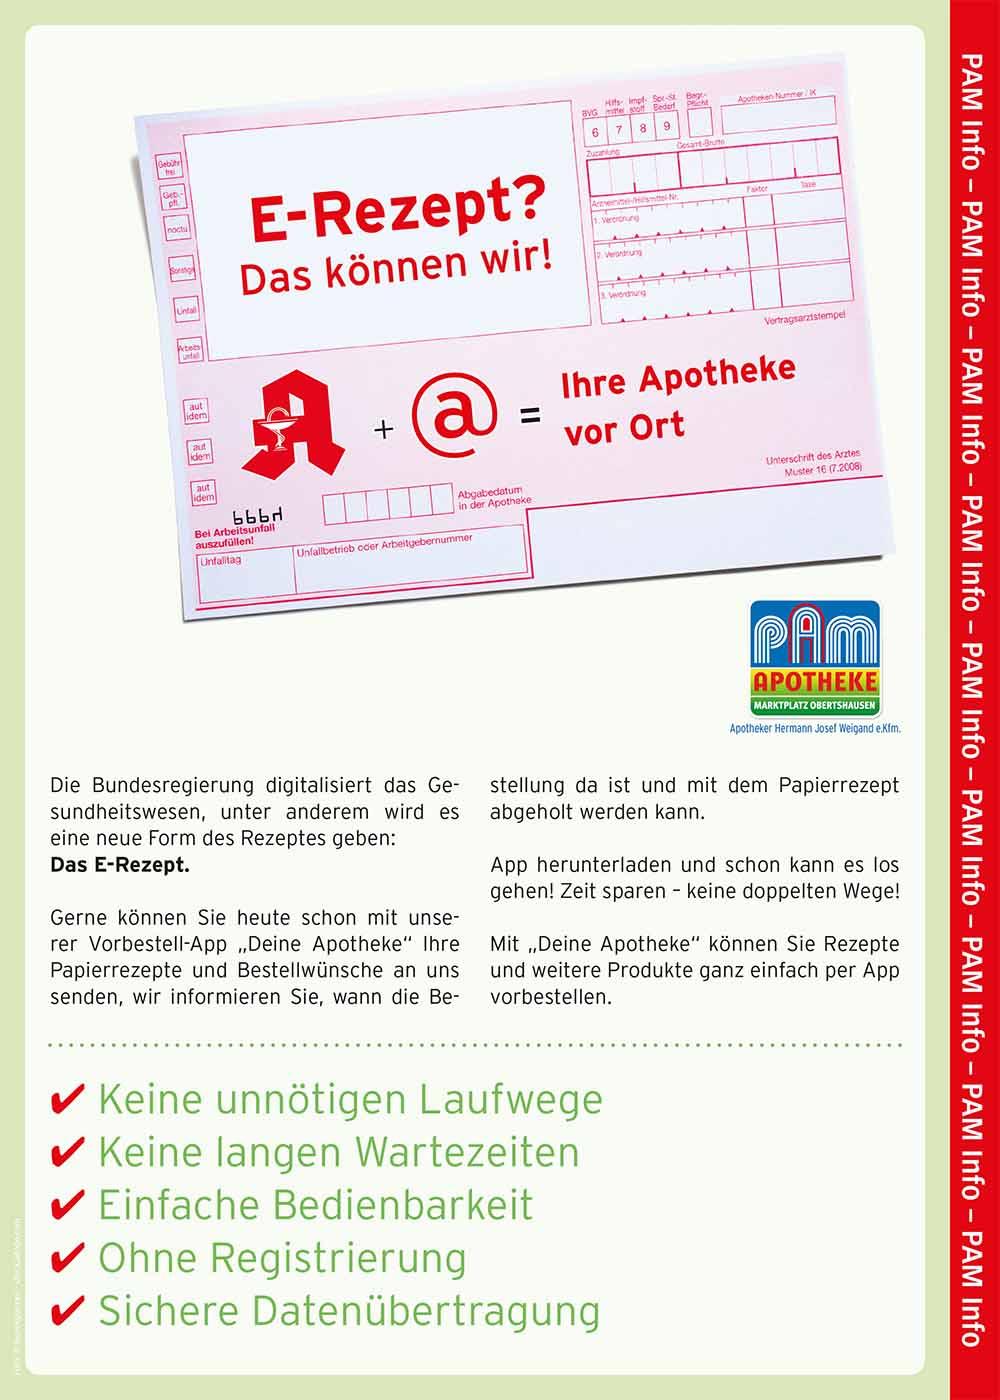 http://www.apotheken.de/fileadmin/clubarea/00000-Angebote/63179_pam_angebot_2.jpg